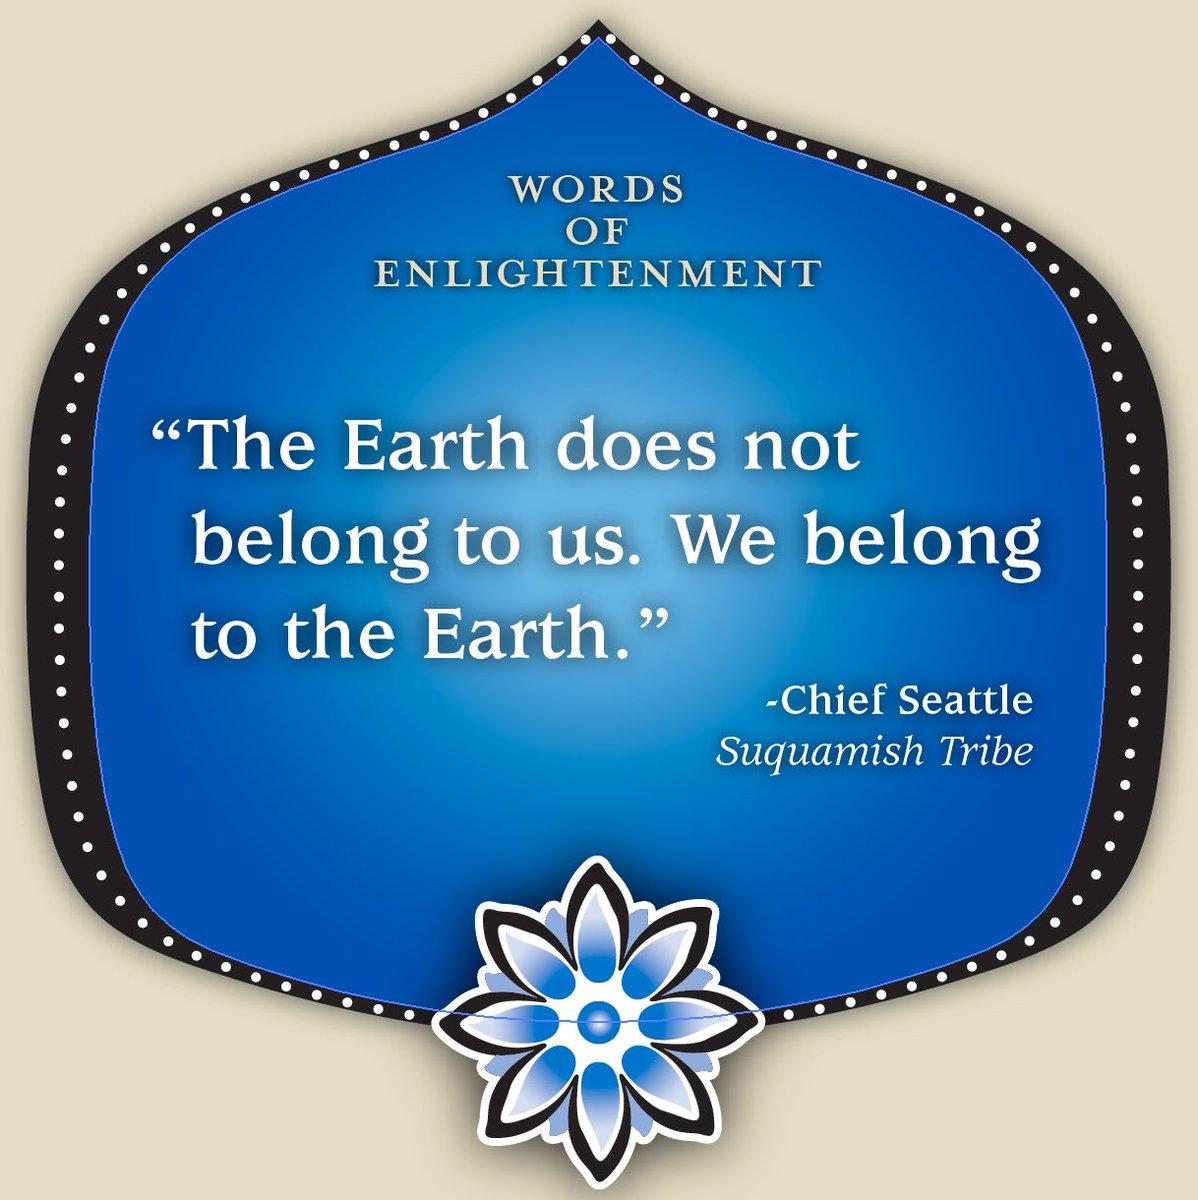 #EarthDay #ItsOurFuture #WordsofEnlightenment #GTsKombucha https://t.co/4KaUQPgBNY